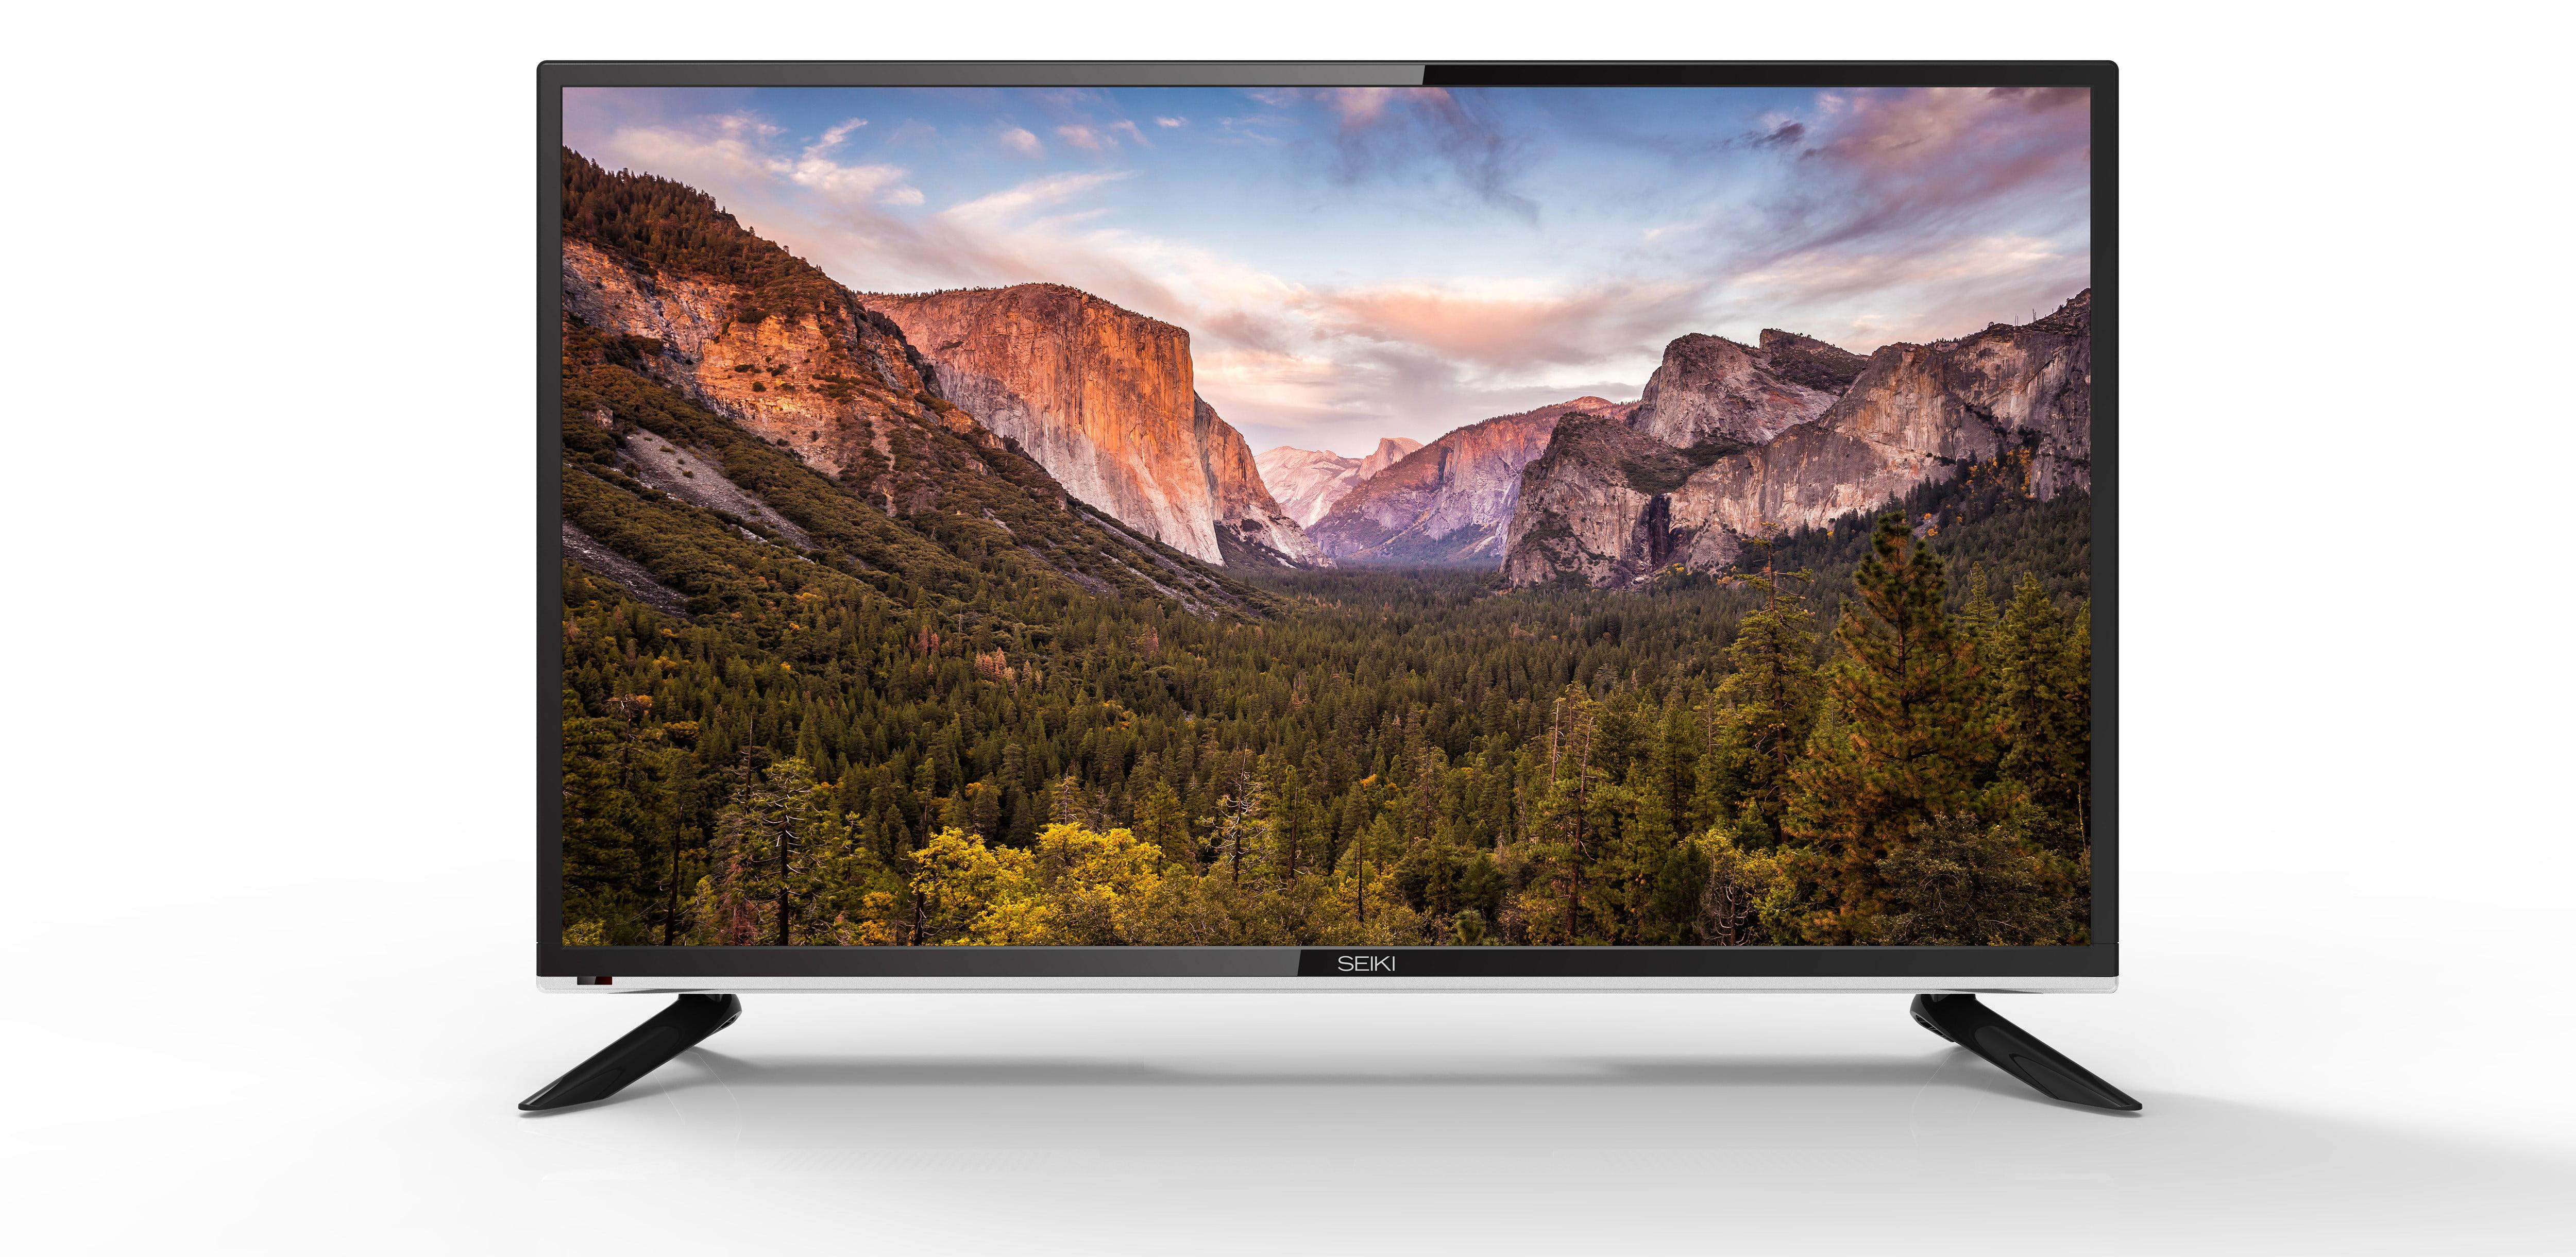 Seiki 32 inch 720p HD LED TV SE32HG